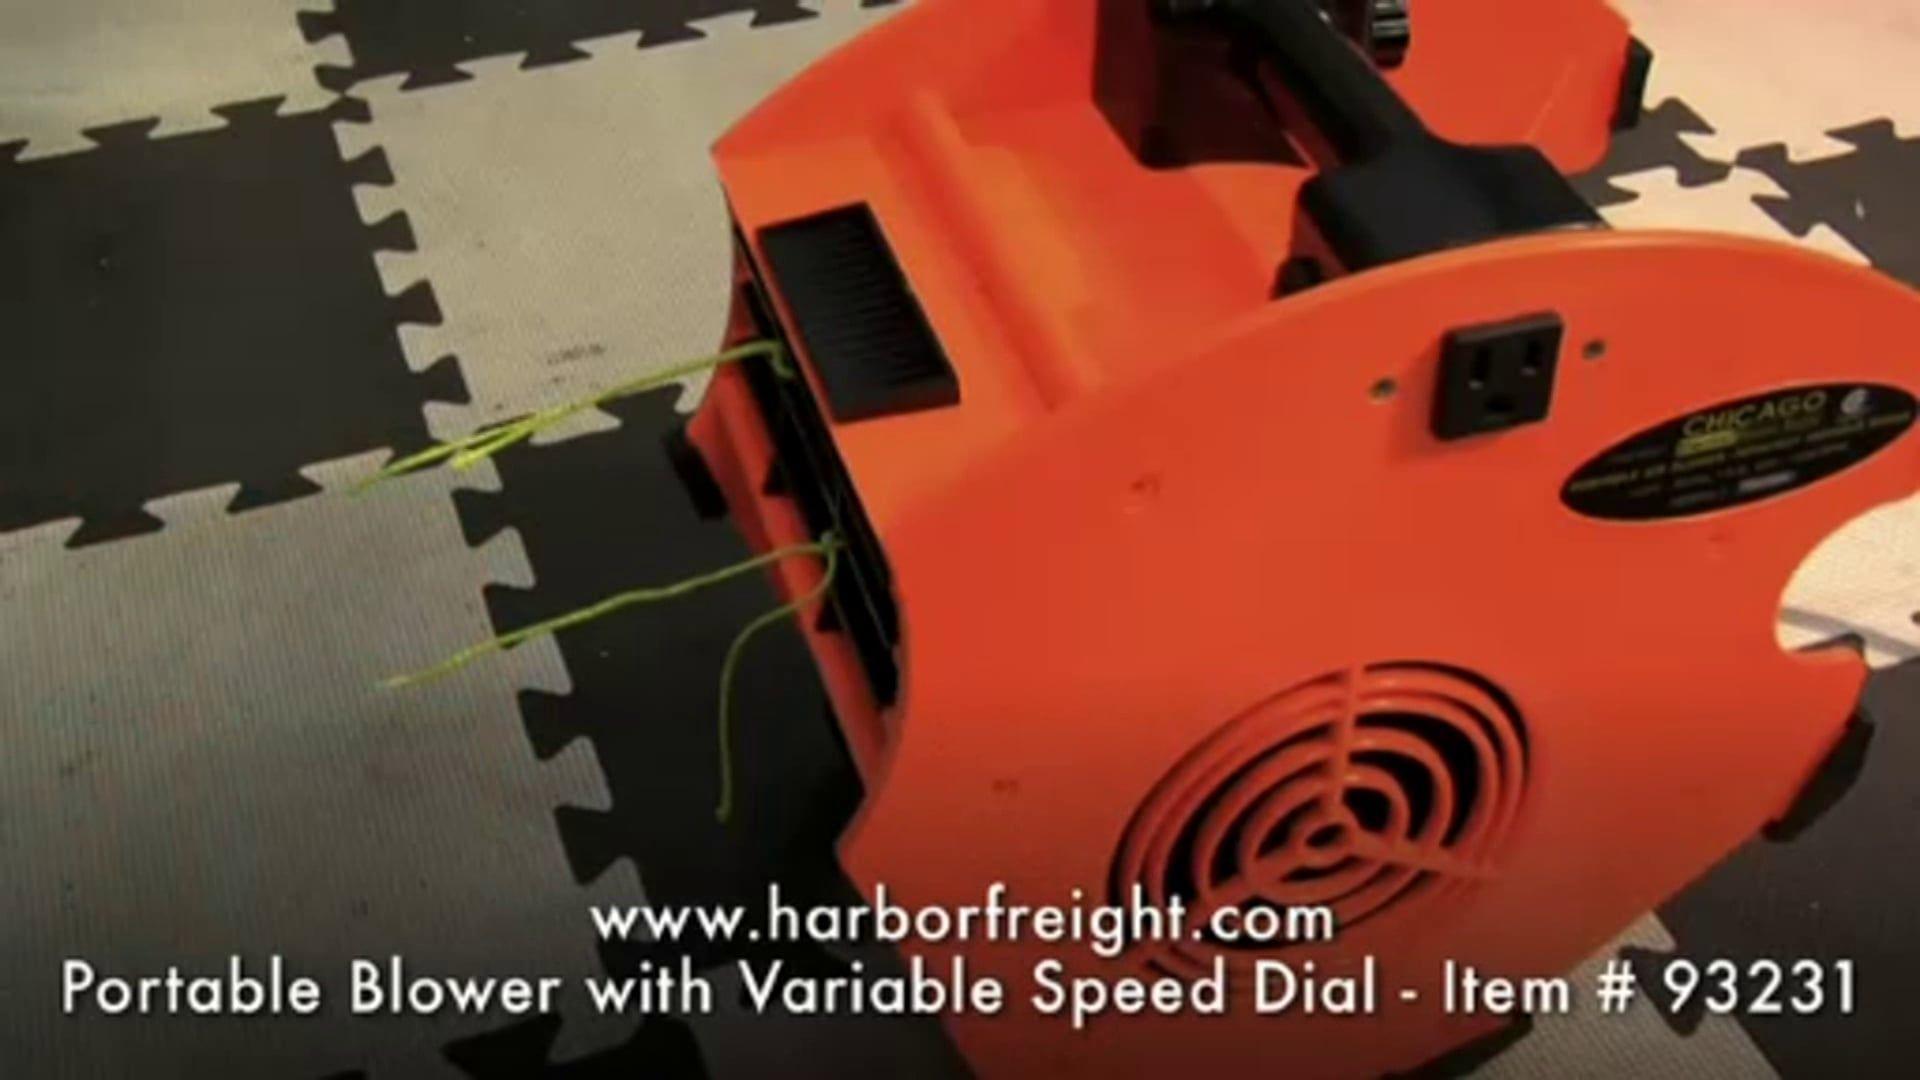 69721 - 3 Speed Portable Blower | Tools/Equipment | Pinterest.